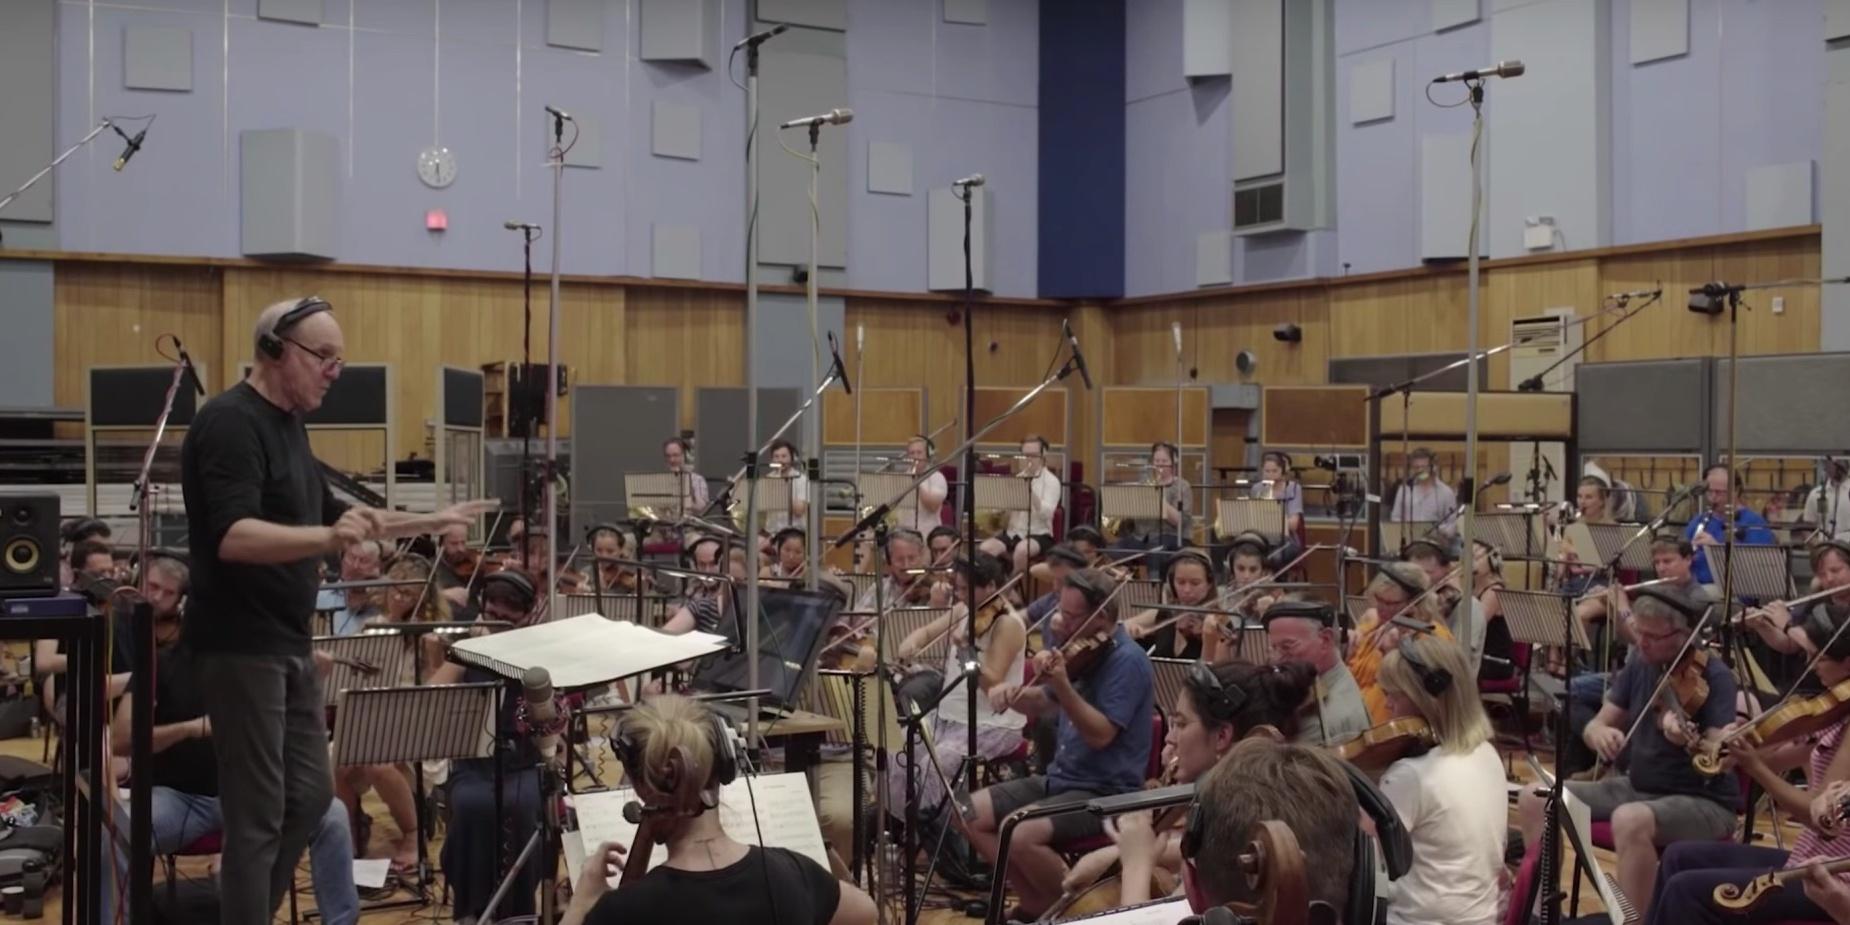 John Williams composes new Star Wars theme for Disneyland attraction – listen